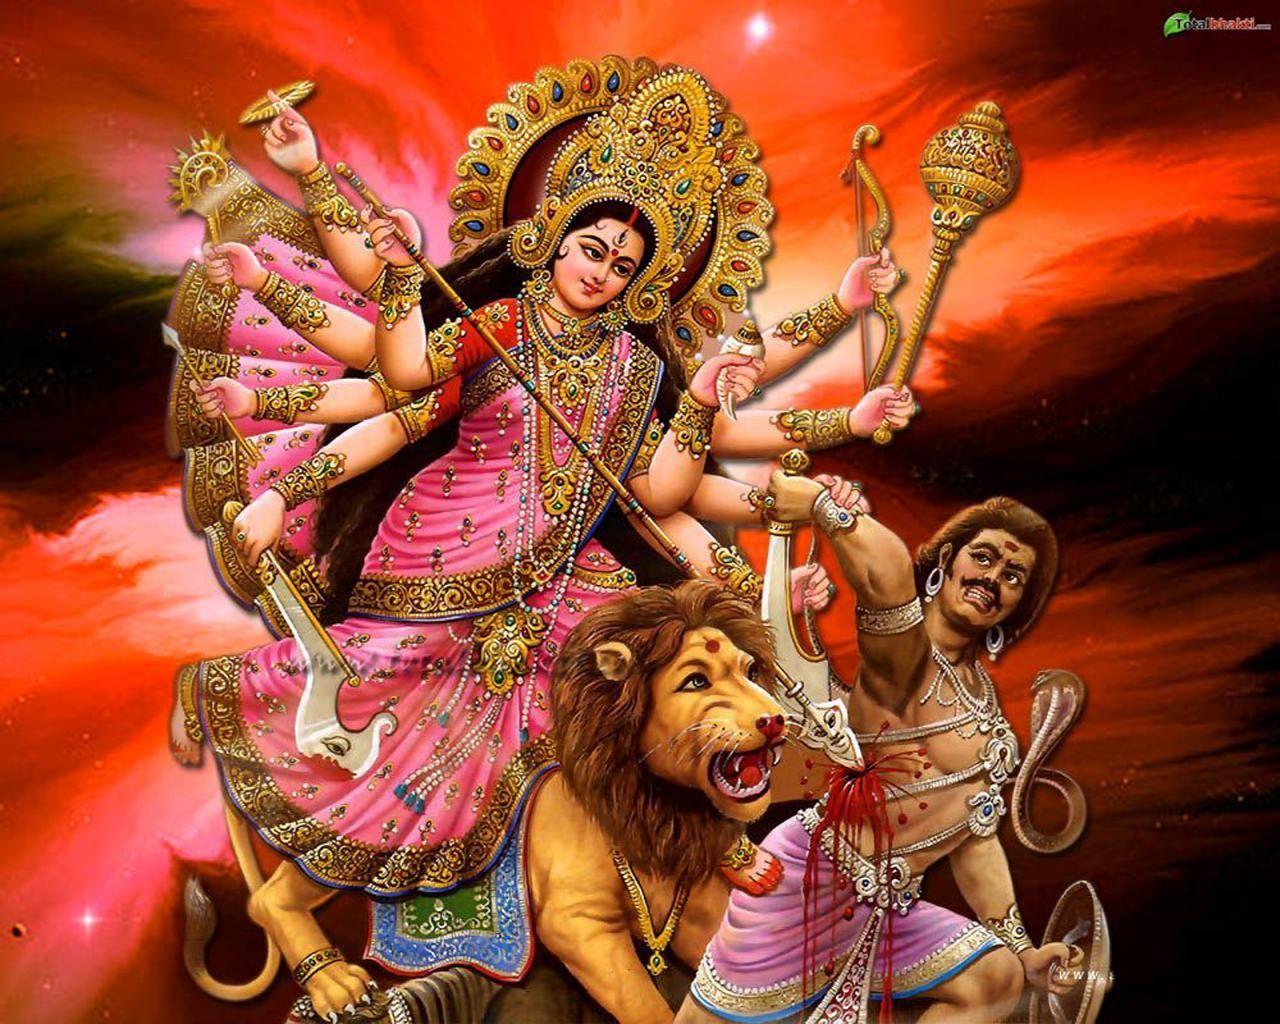 Download Hd Wallpaper Durga Maa Hd Backgrounds Download